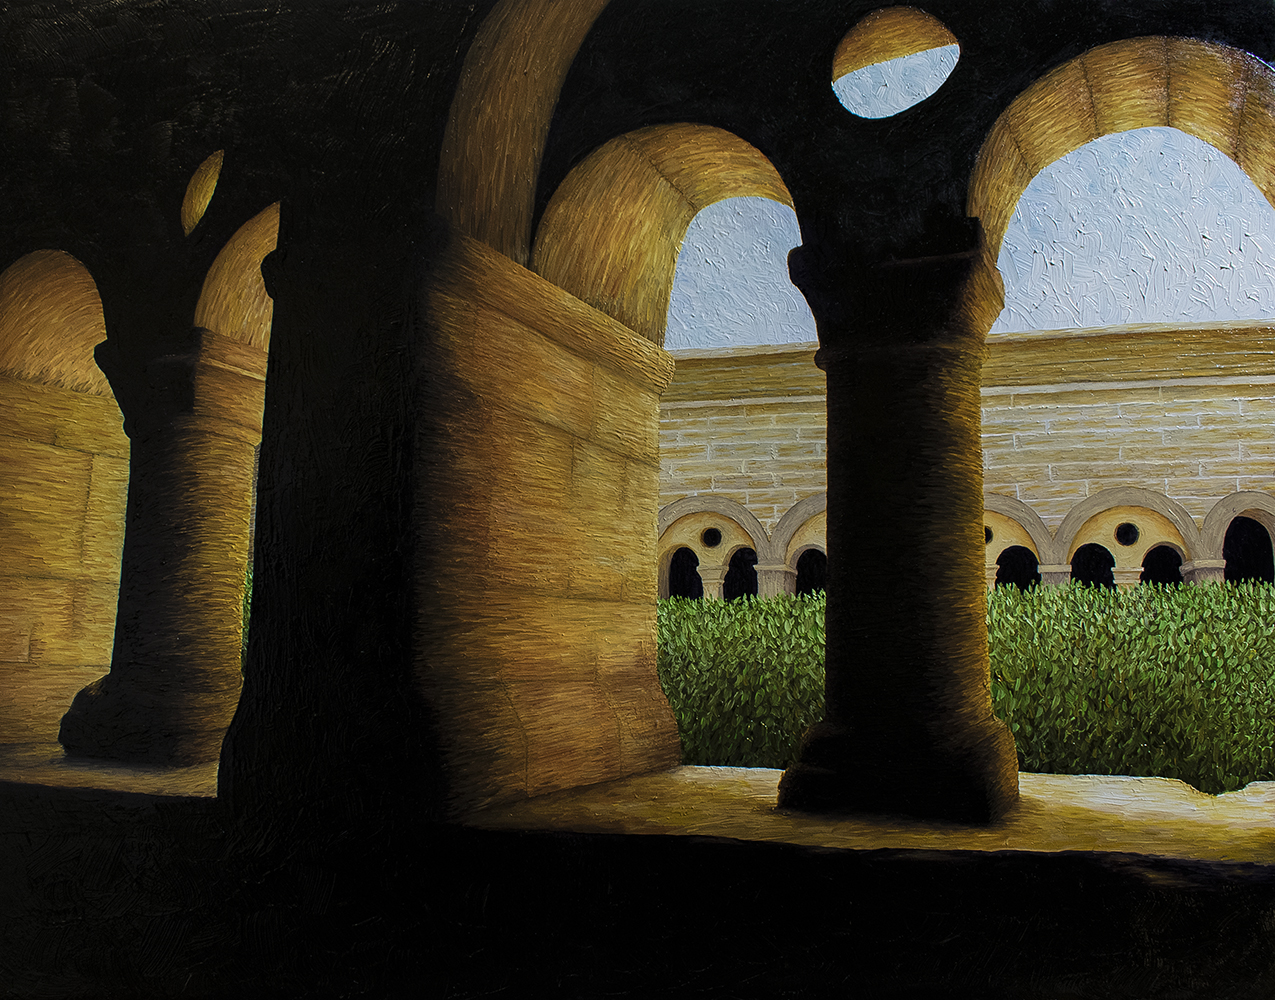 Arches à Thoronet